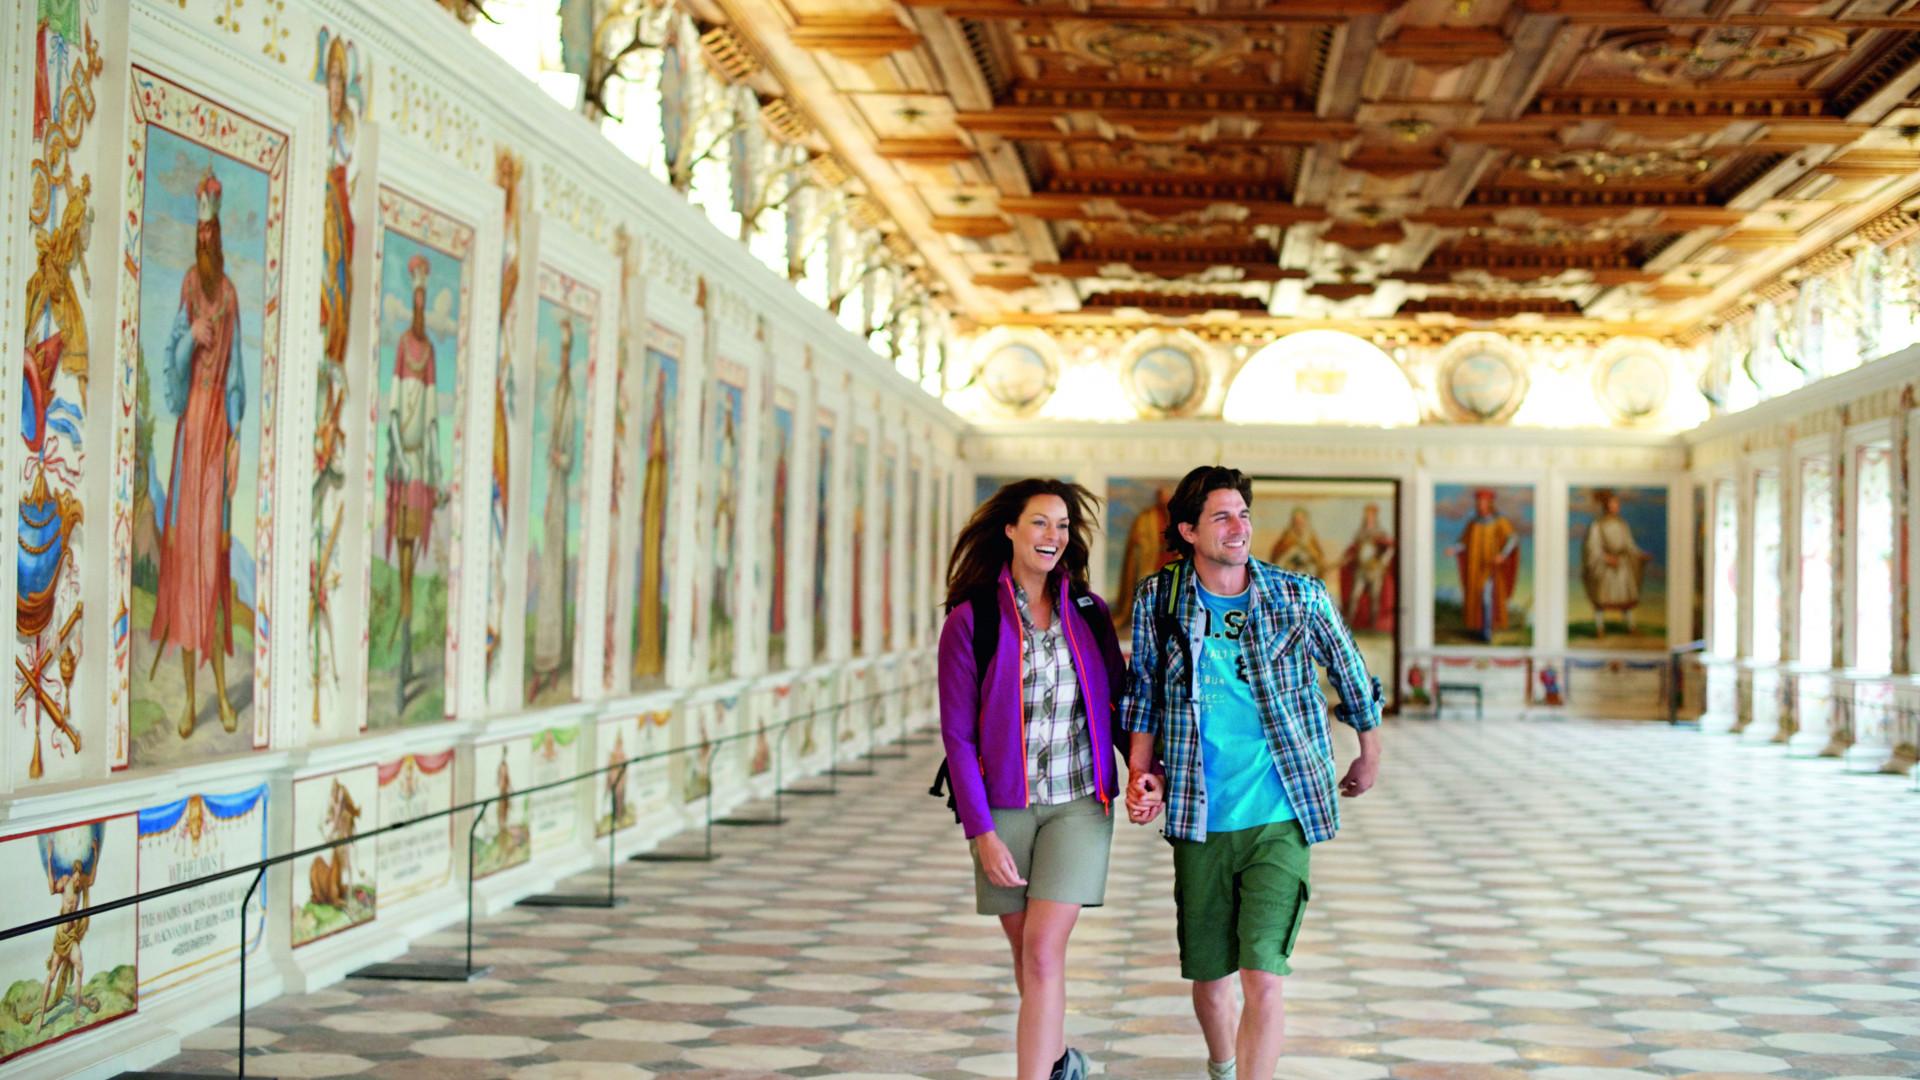 Exploring Innsbruck's heritage